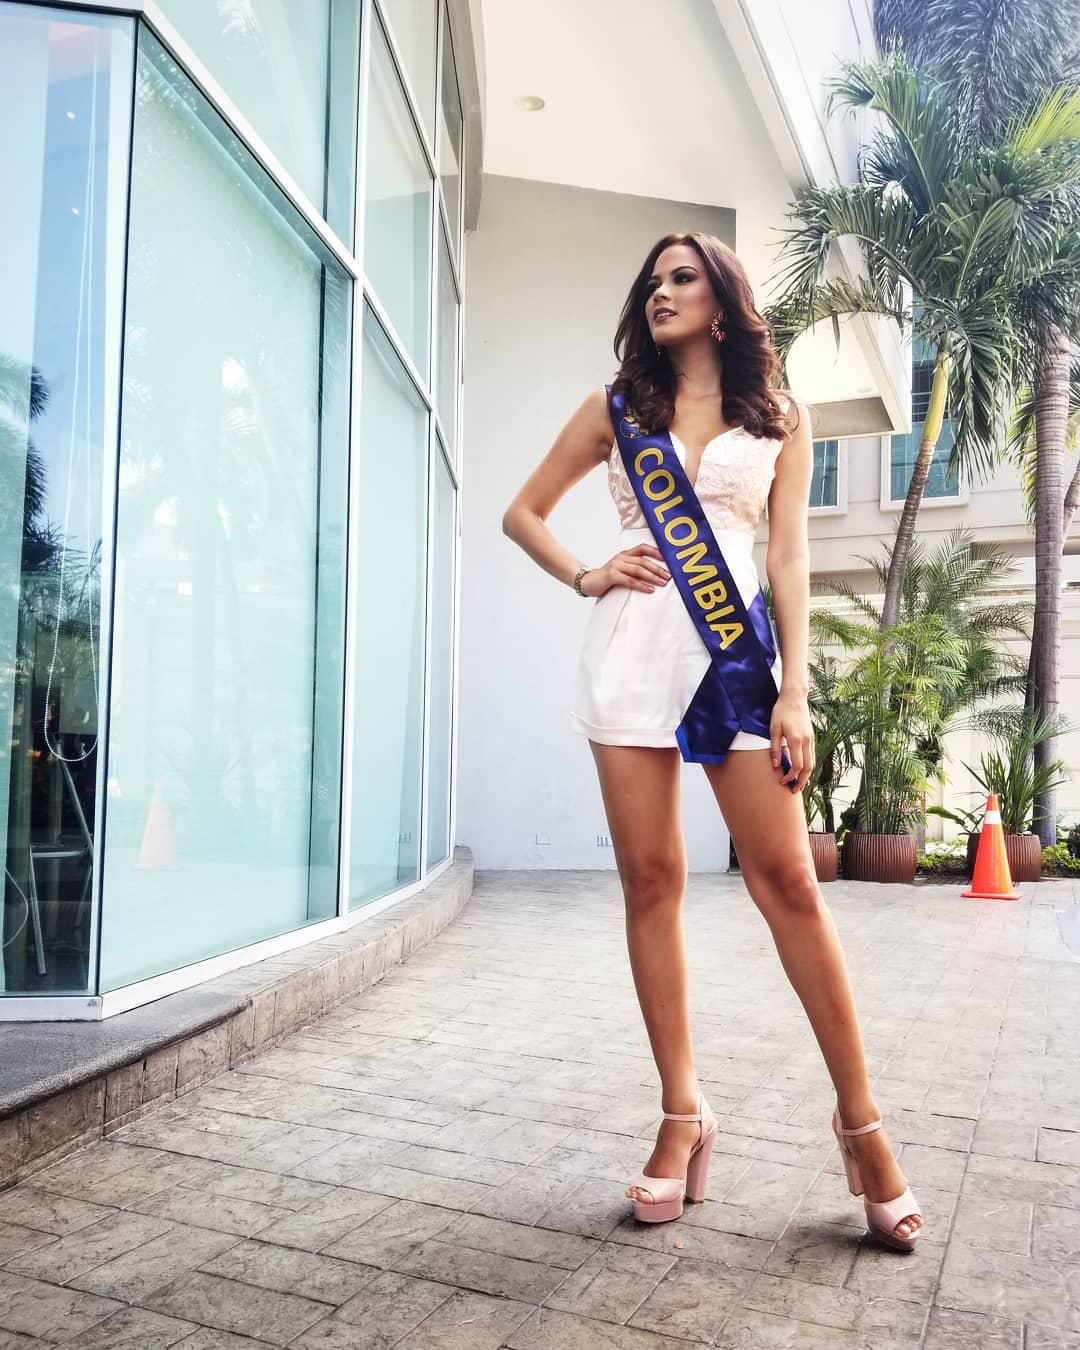 ana catalina mouthon, 2nd runner-up de miss continentes unidos 2018. - Página 2 41382010